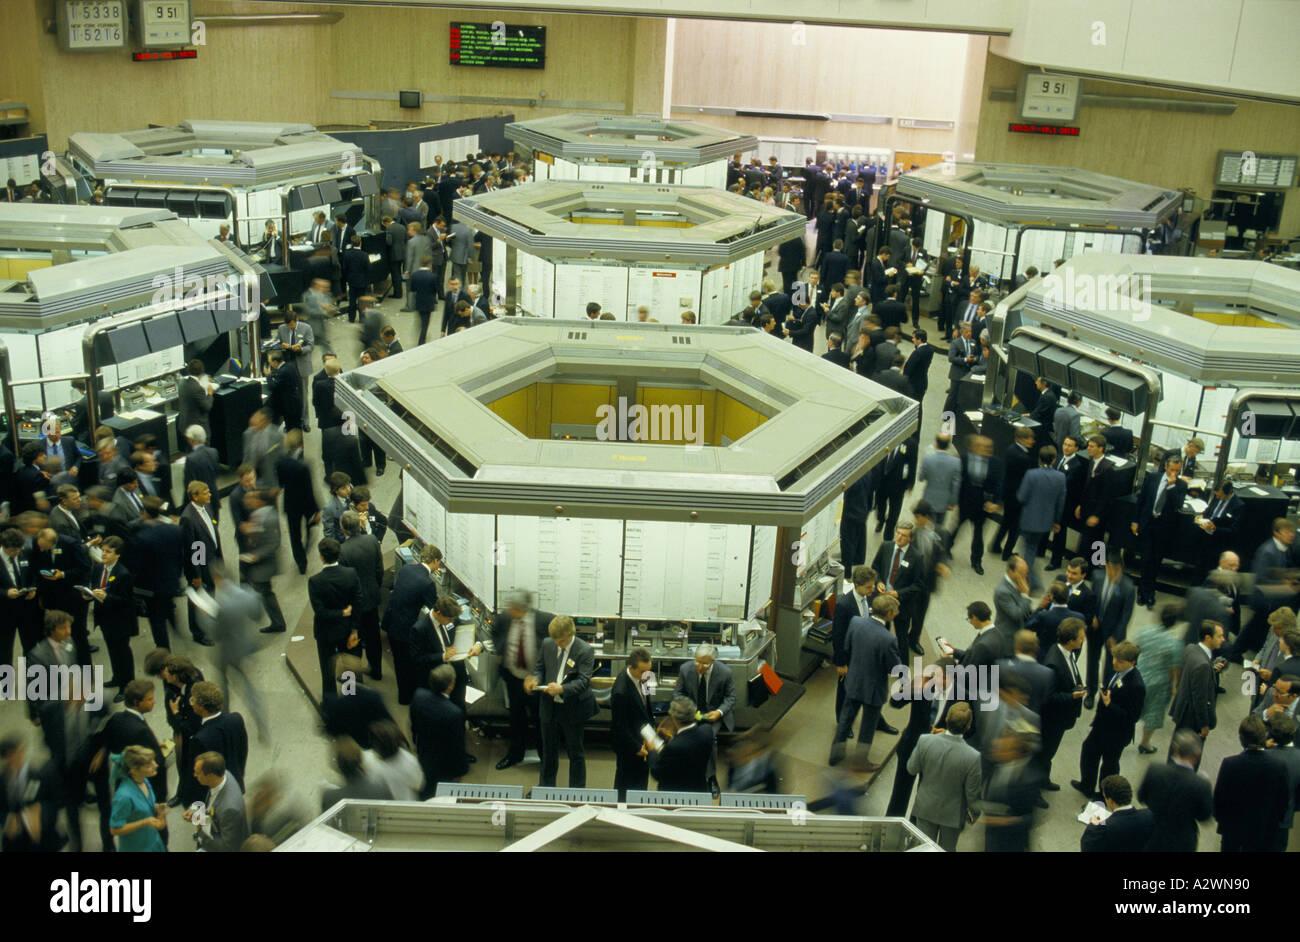 Trade uk stock options